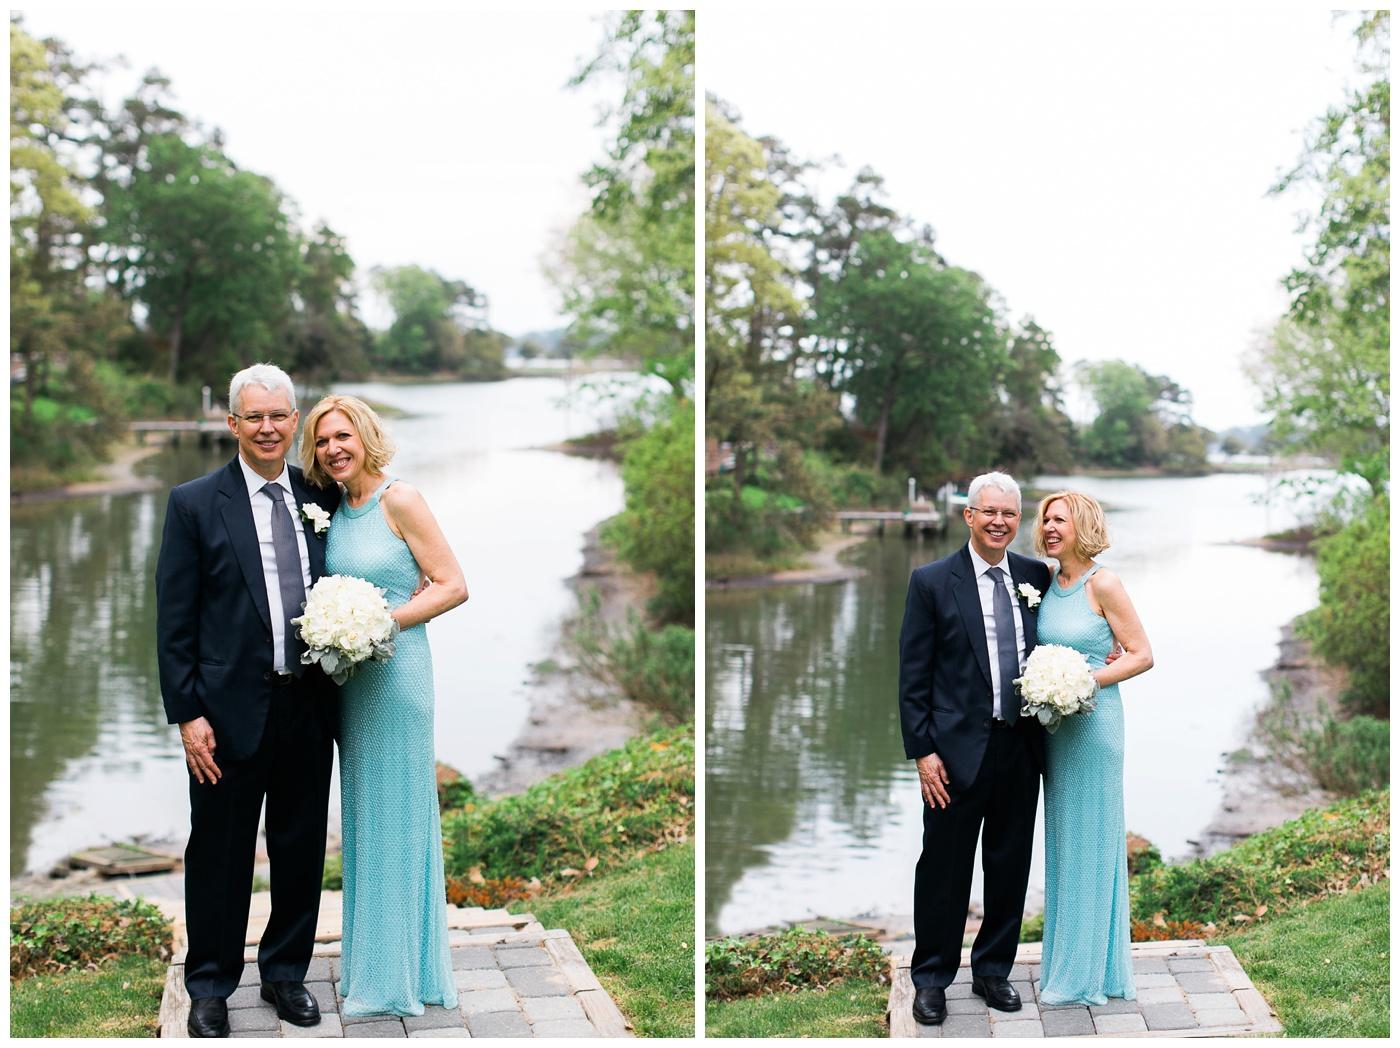 Patty & Matt   Backyard Wedding